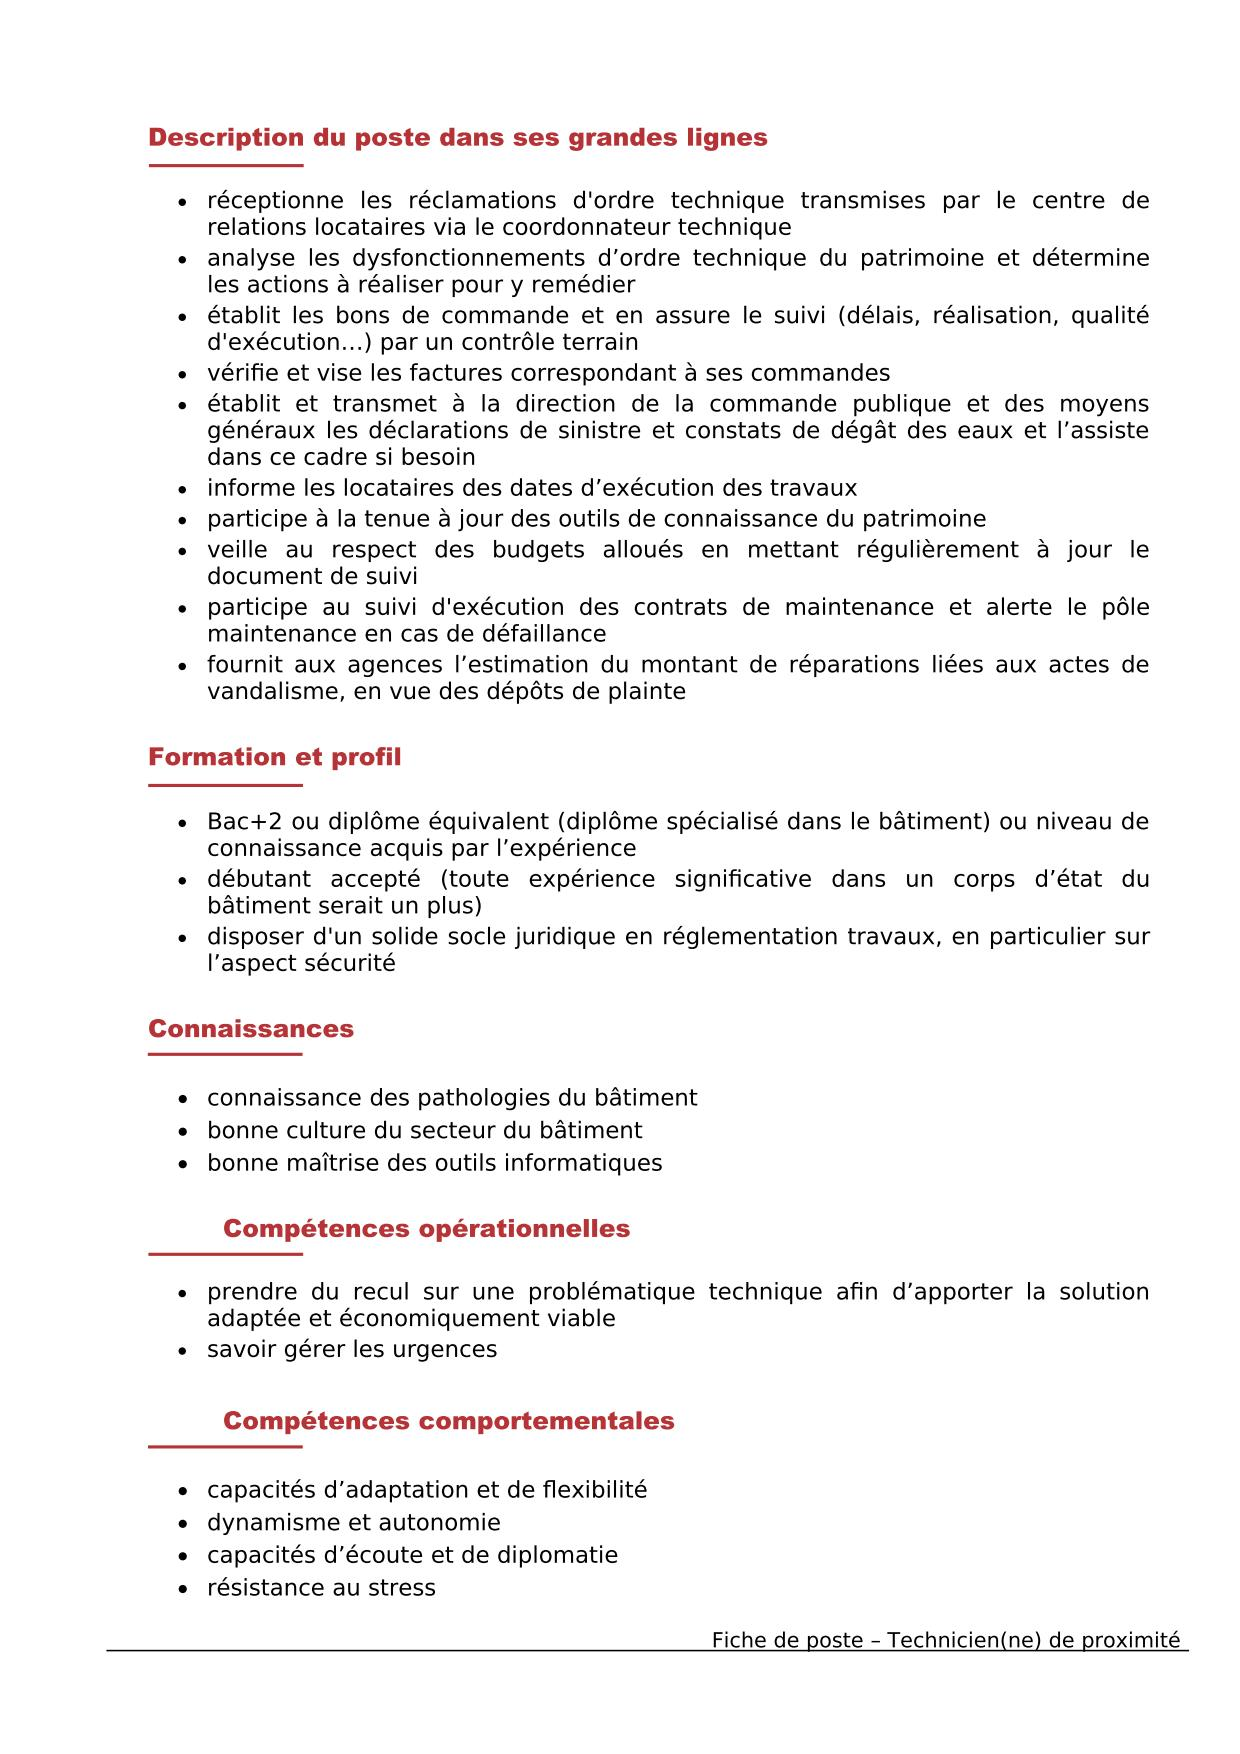 HABITAT08-02